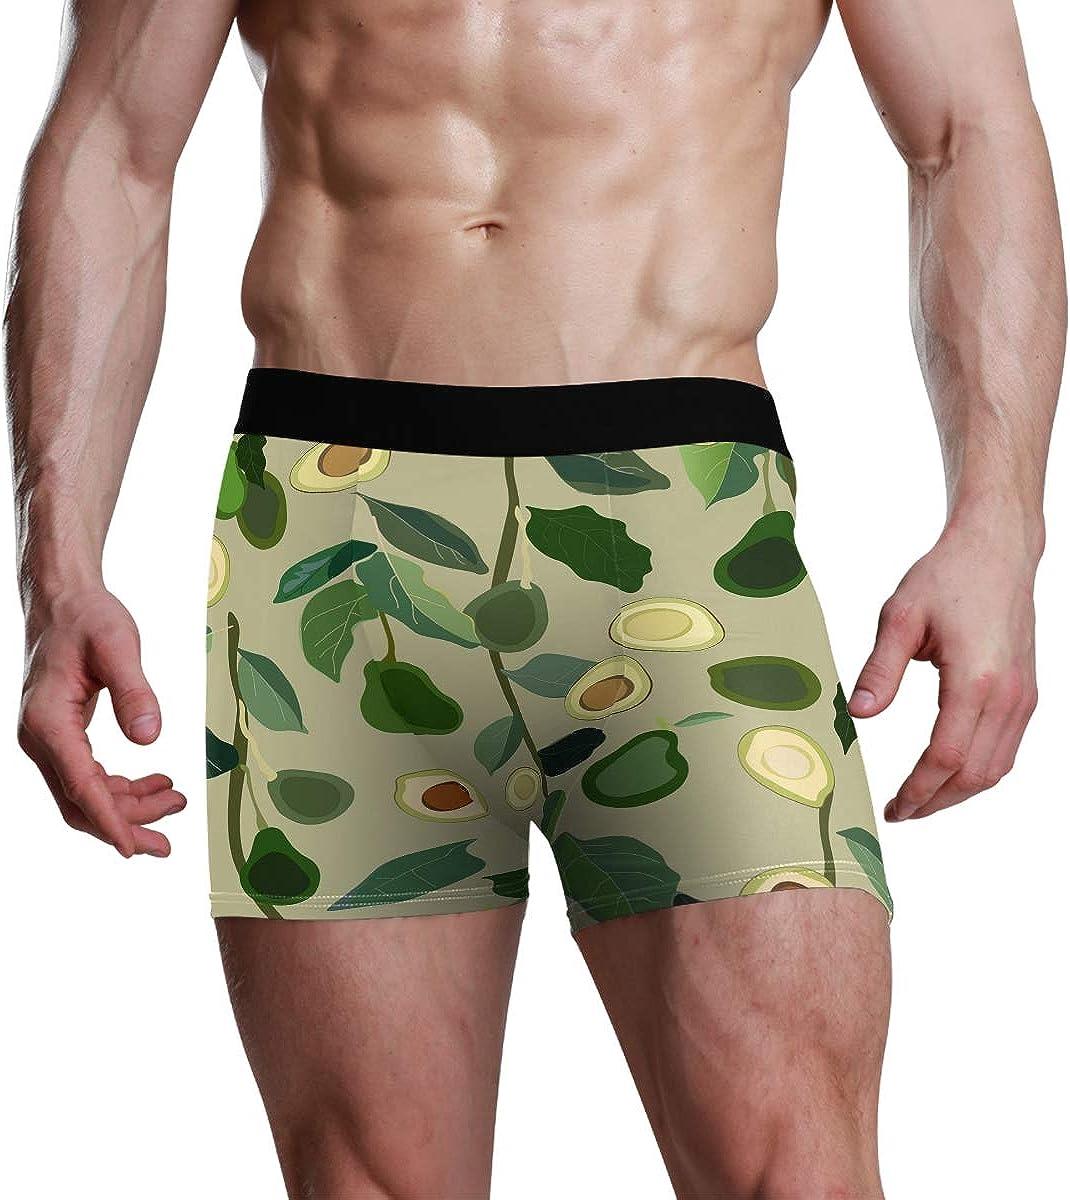 Mens Boxer Briefs Cartoon Cute Hot Avocado Fabulous Green Low Rise Trunks Underwear Breathable Bikini Boys